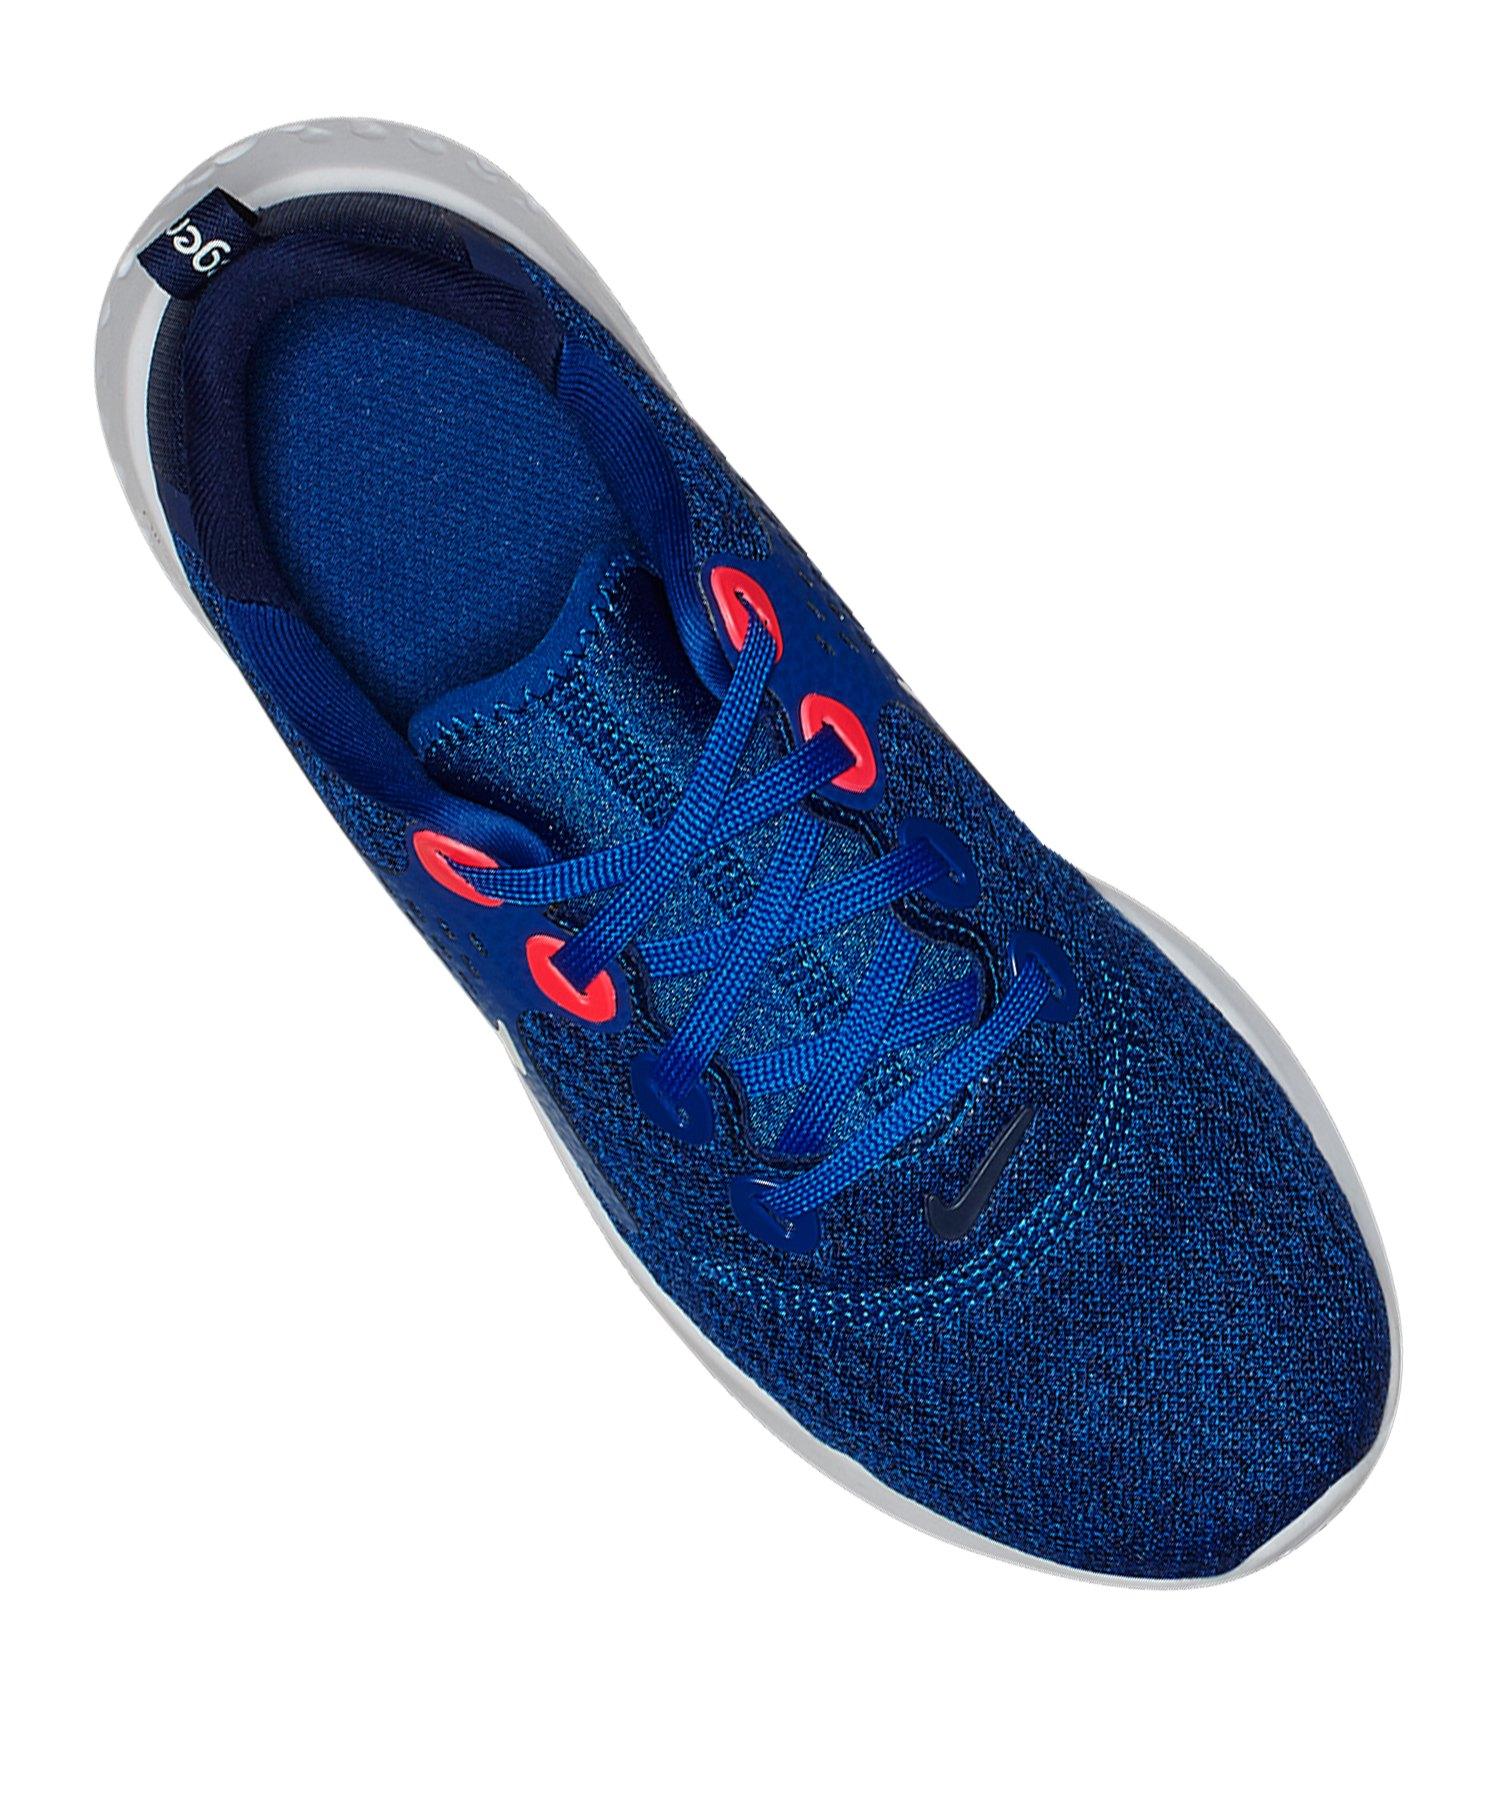 half off 08d7b 973c7 ... Nike Legend React Running Kids Blau Weiss F402 - blau ...